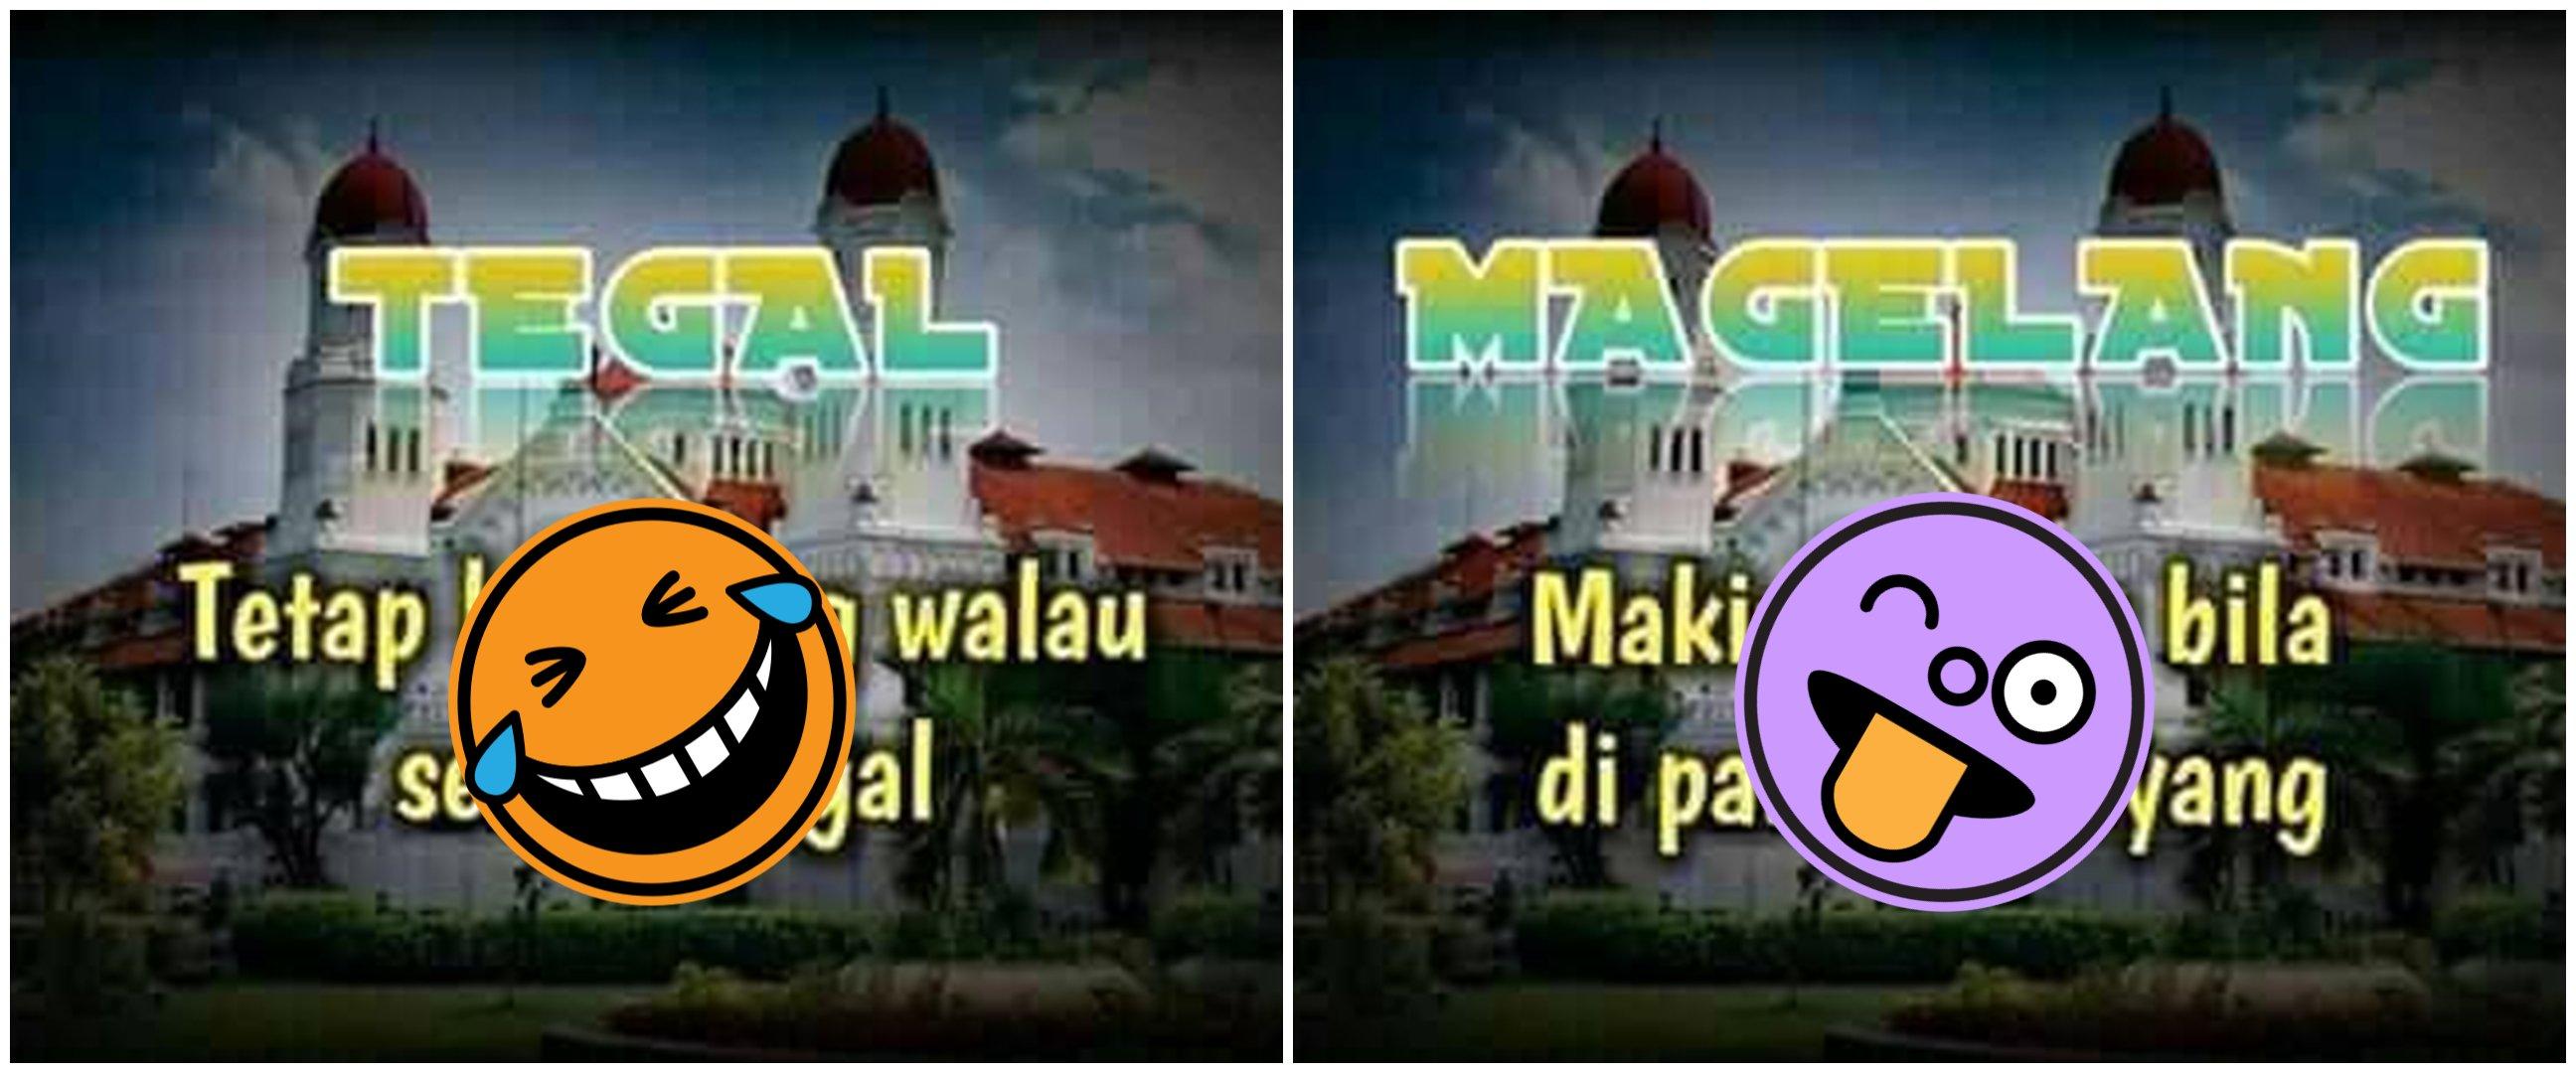 Pelesetan lucu kepanjangan nama 30 kota di Jawa Tengah, kocak banget